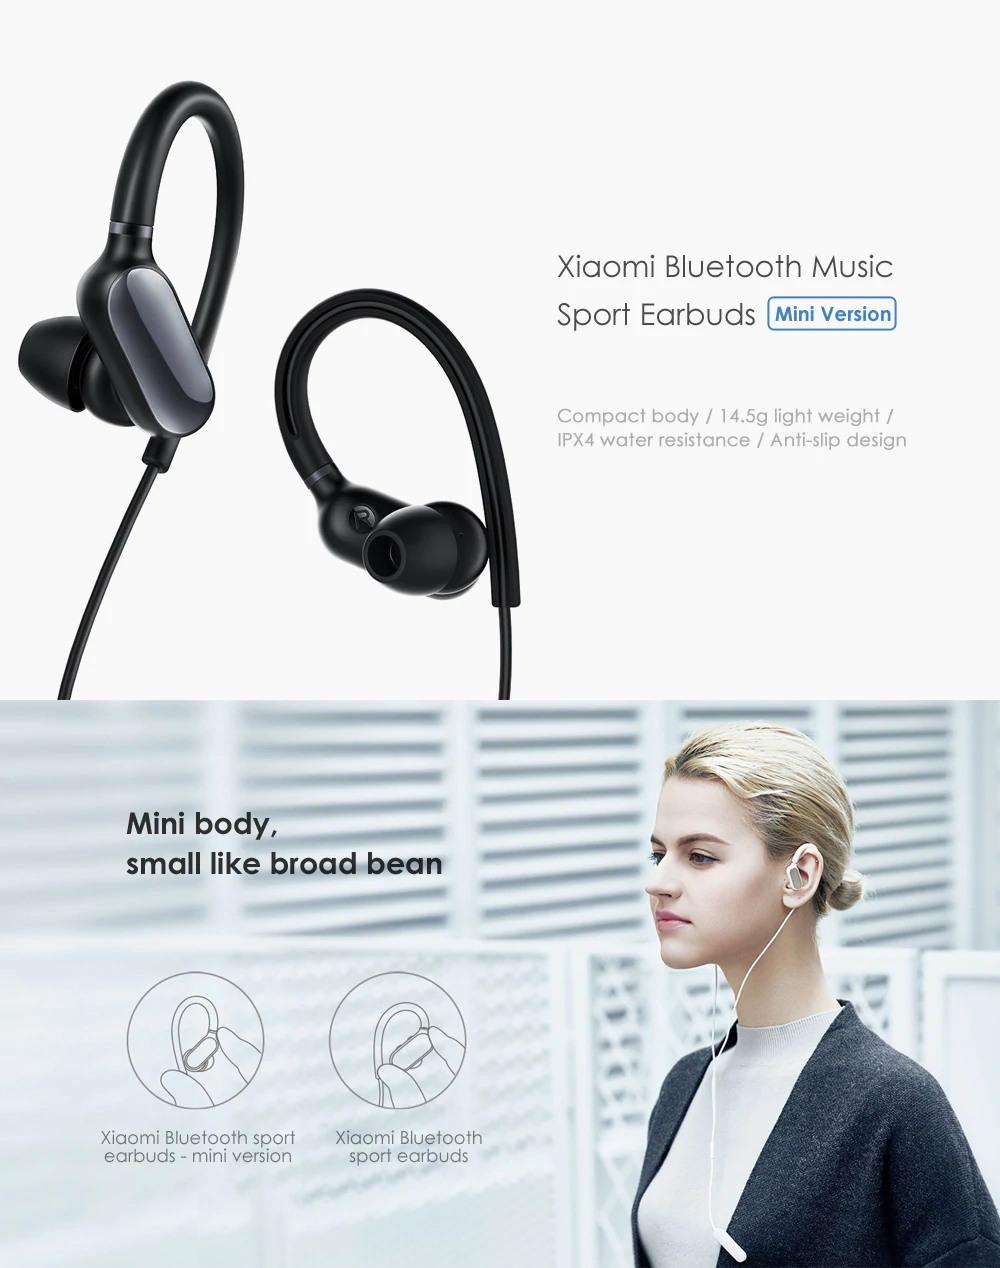 [Image: Xiaomi-Bluetooth-Music-Sport-Earbuds-1.jpg]